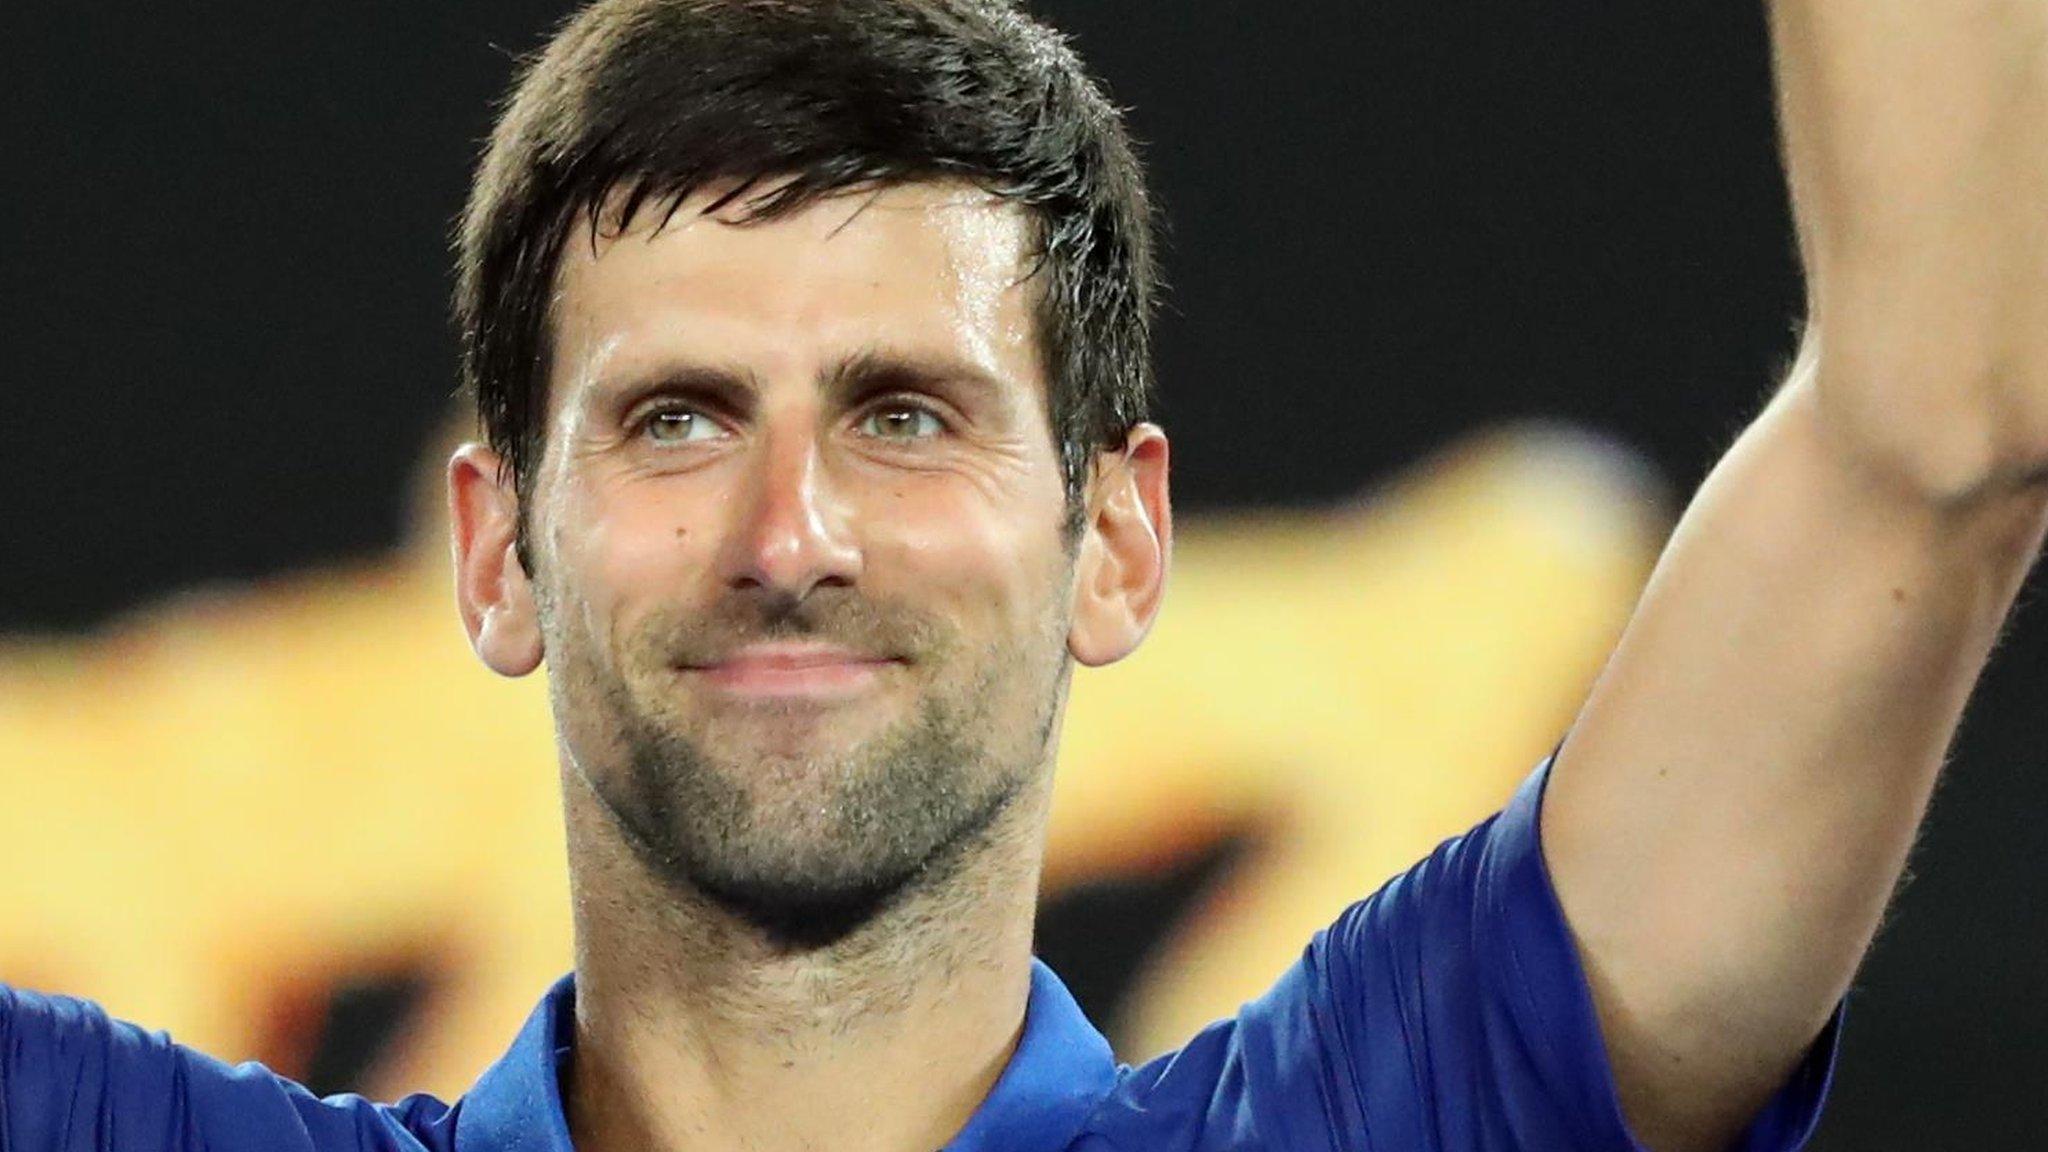 Australian Open 2019: Novak Djokovic beats Jo-Wilfried Tsonga to reach third round